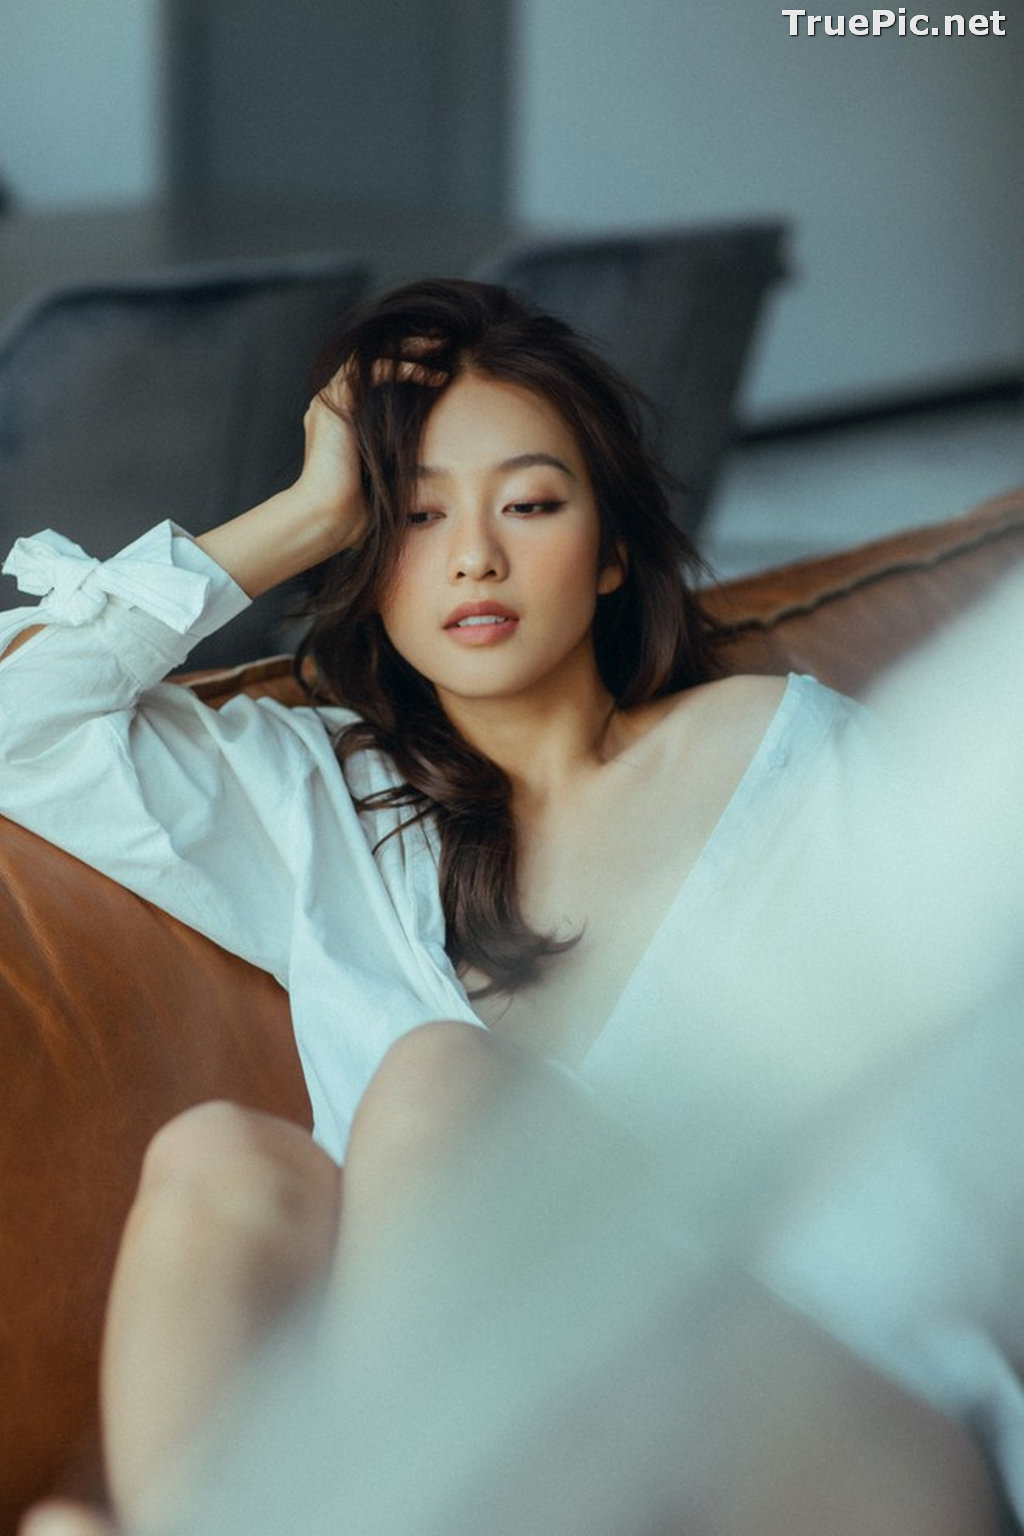 Image Vietnamese Hot Girl - Kha Ngan - Gentle Young Charming - TruePic.net - Picture-5